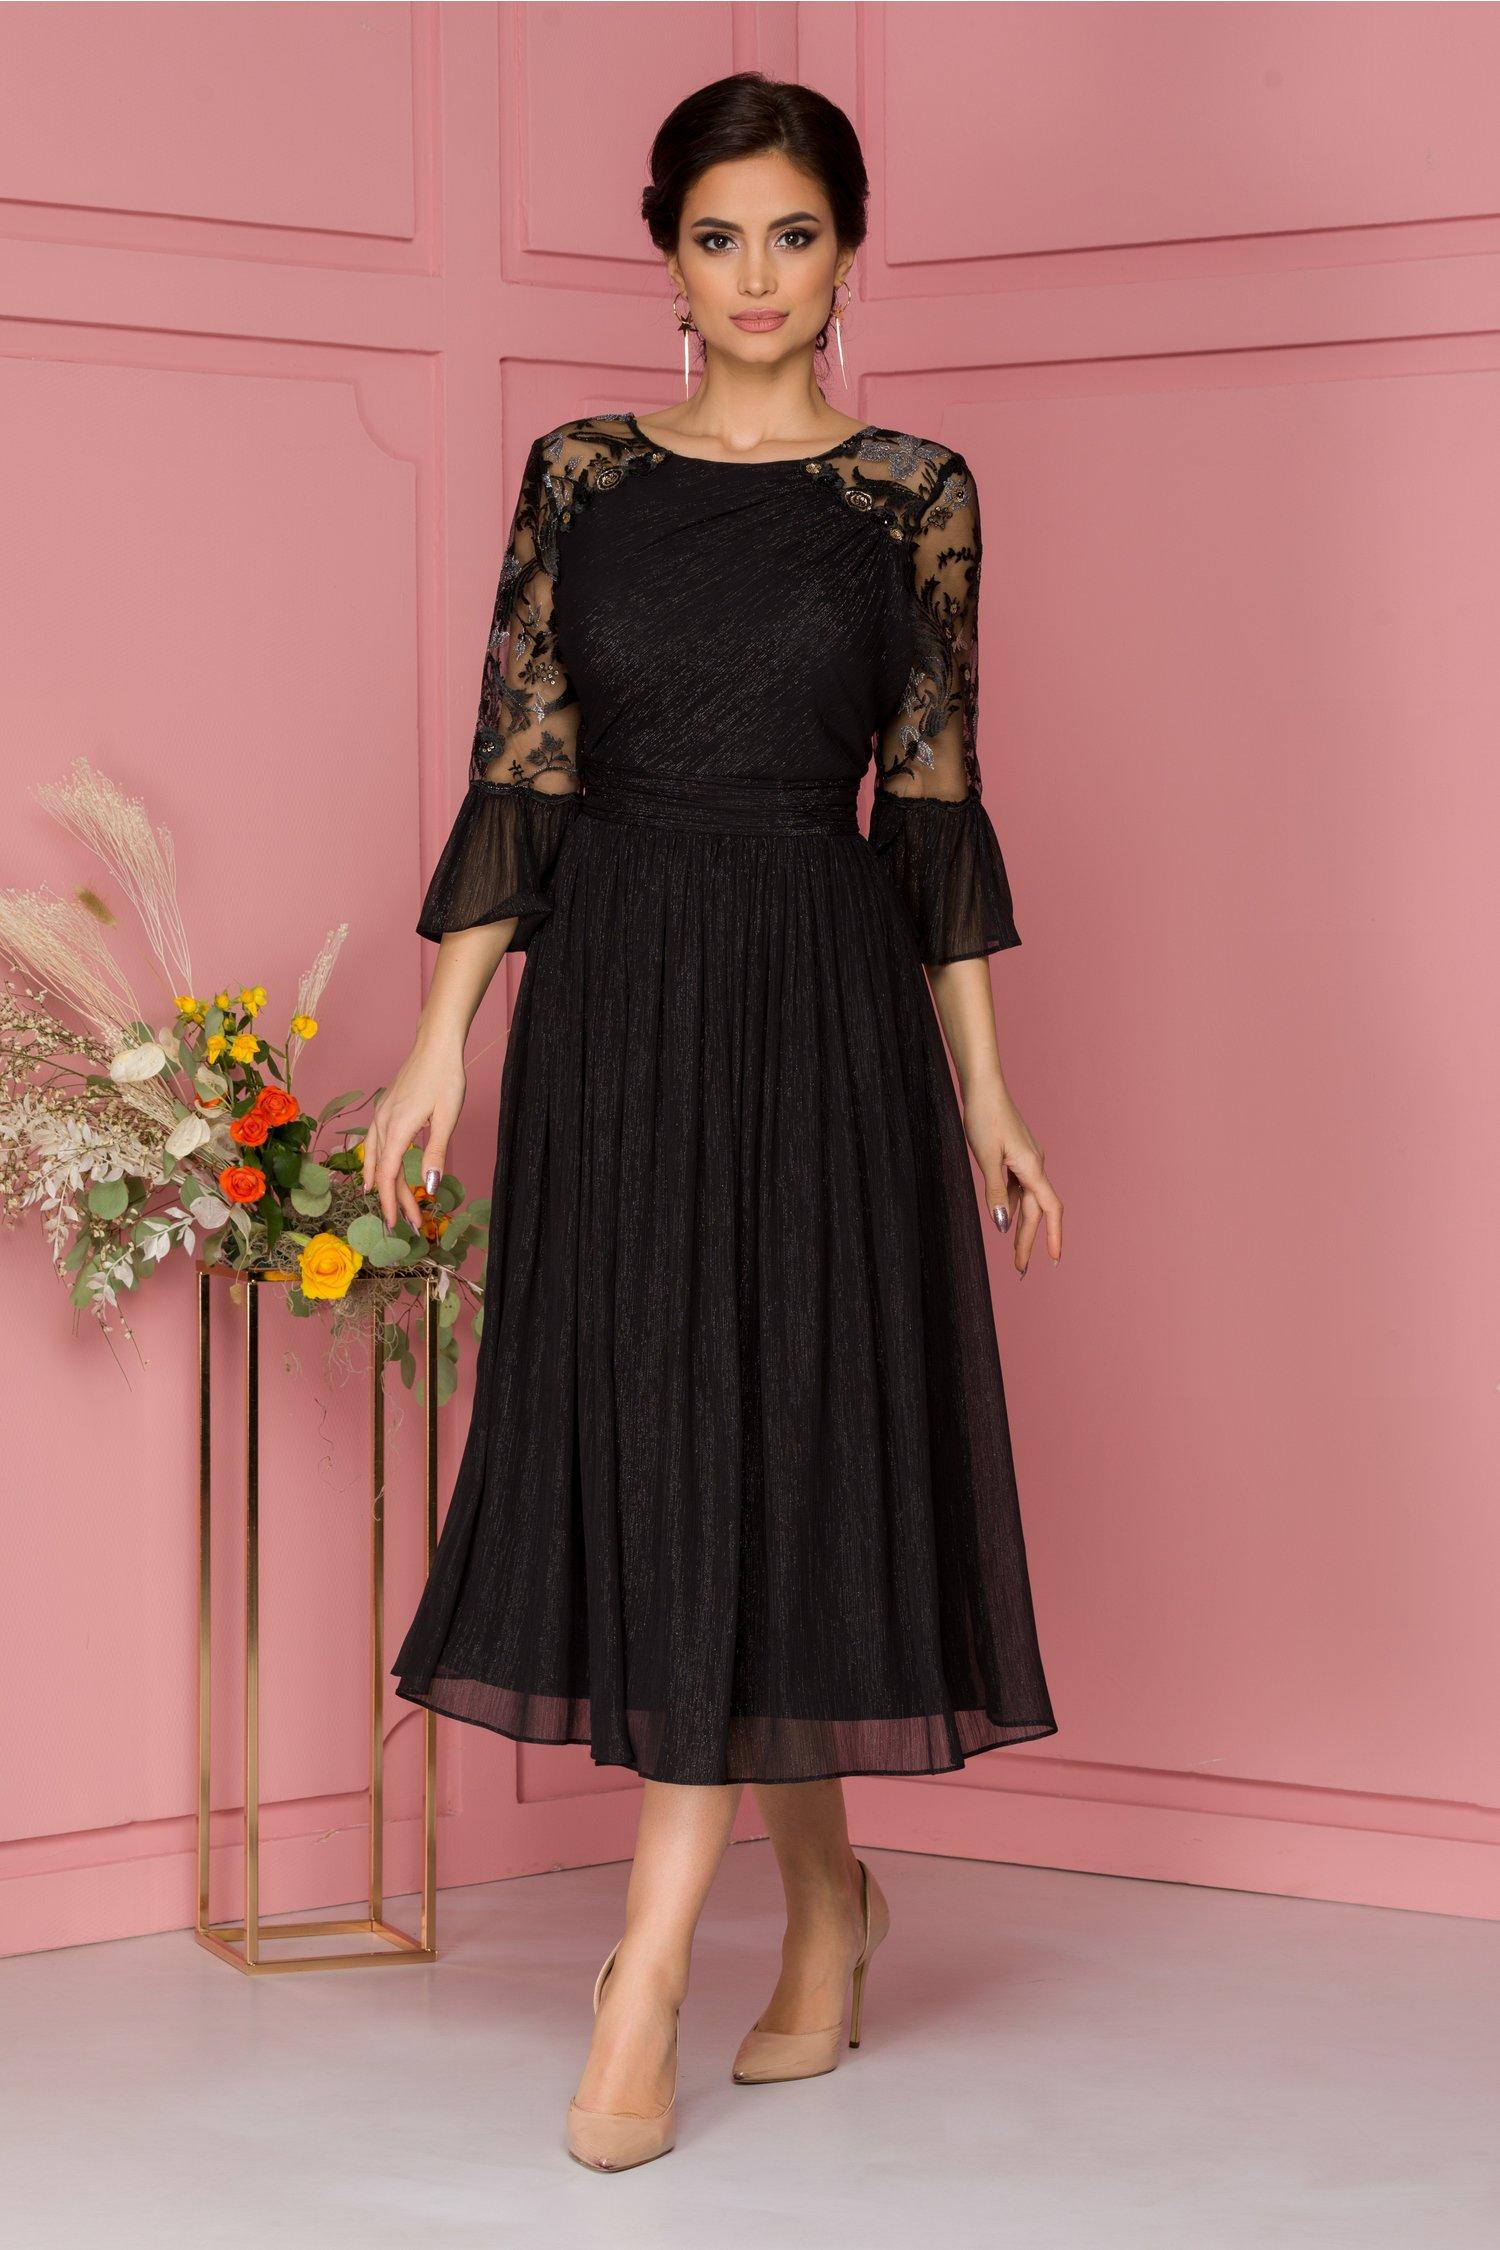 Rochie Leonard Collection neagra cu lurex auriu si broderie florala cu paiete